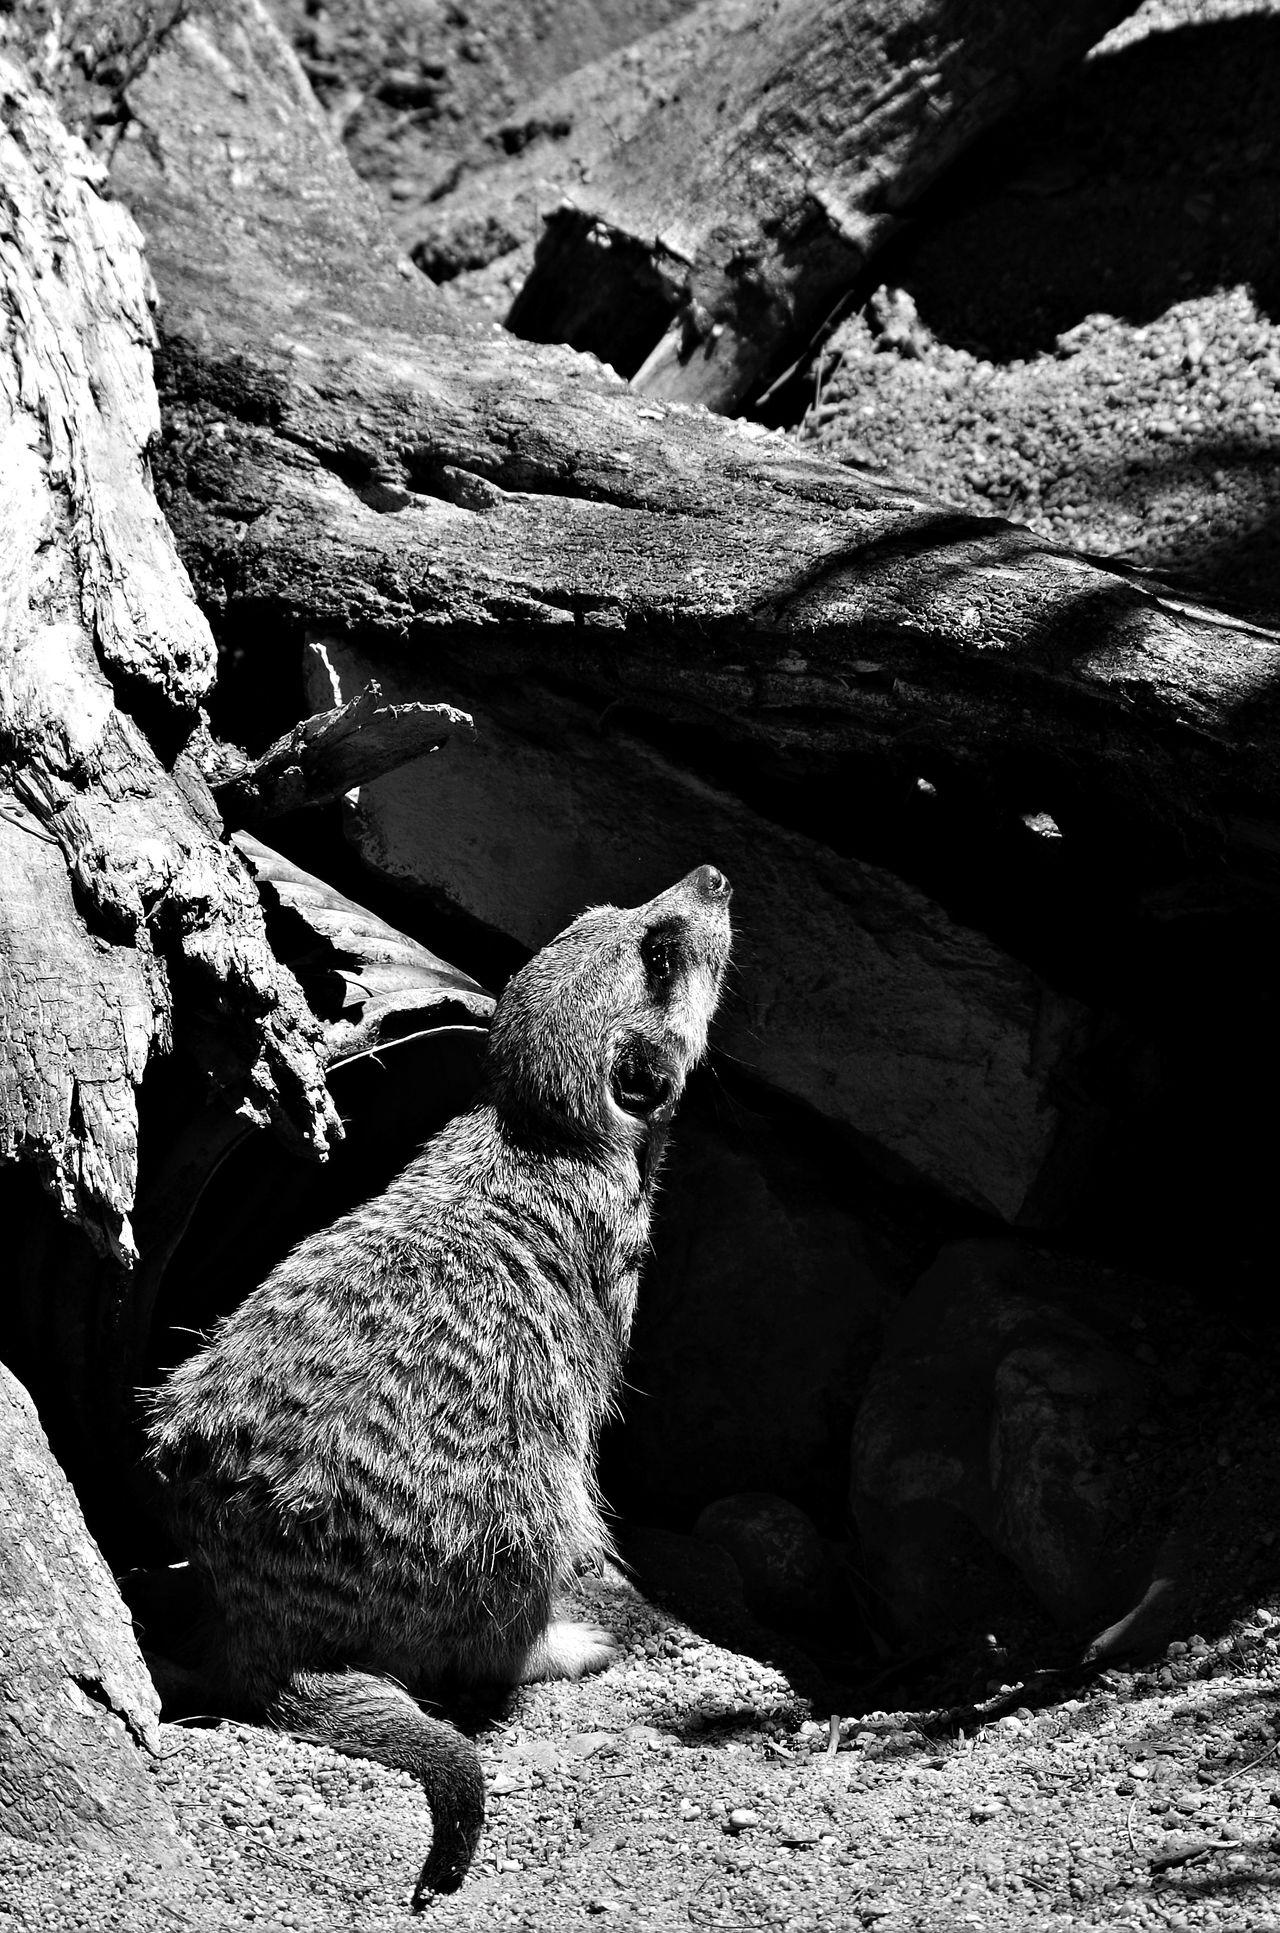 Meerkat, always alert Animal Themes Animal Wildlife Day Mammal Meerkat Nature No People One Animal Outdoors